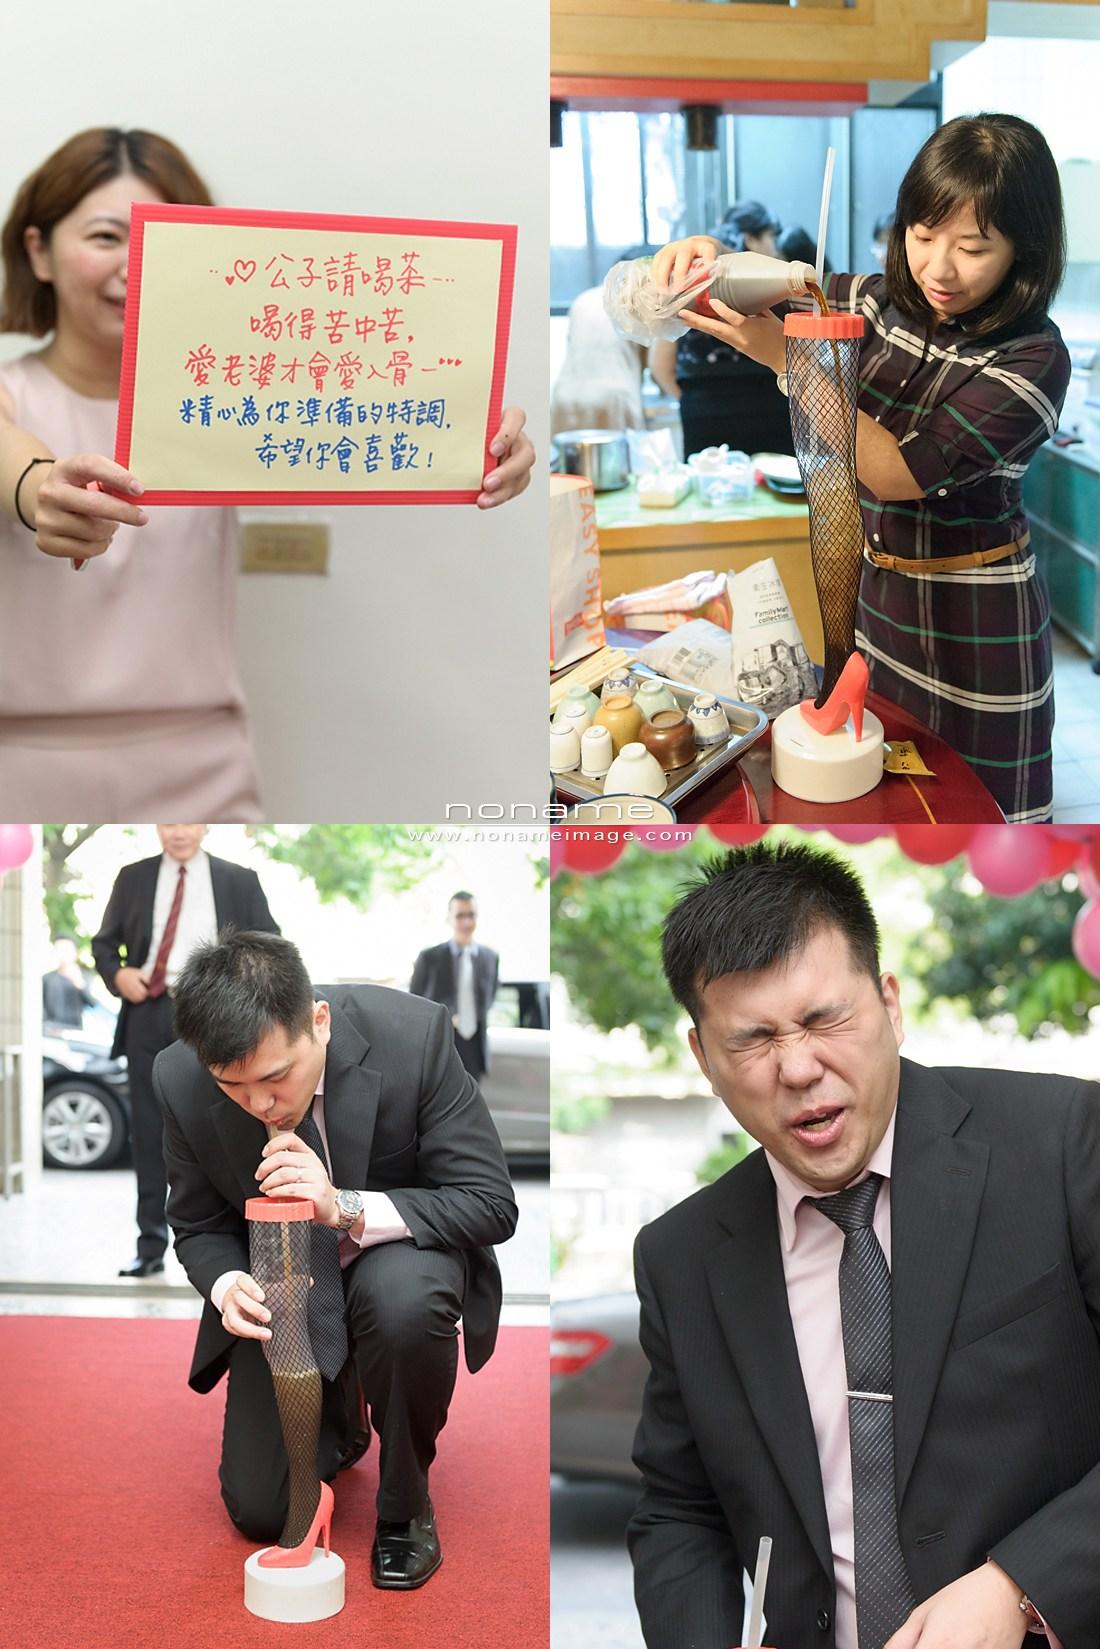 無名影像 nonameimage.com